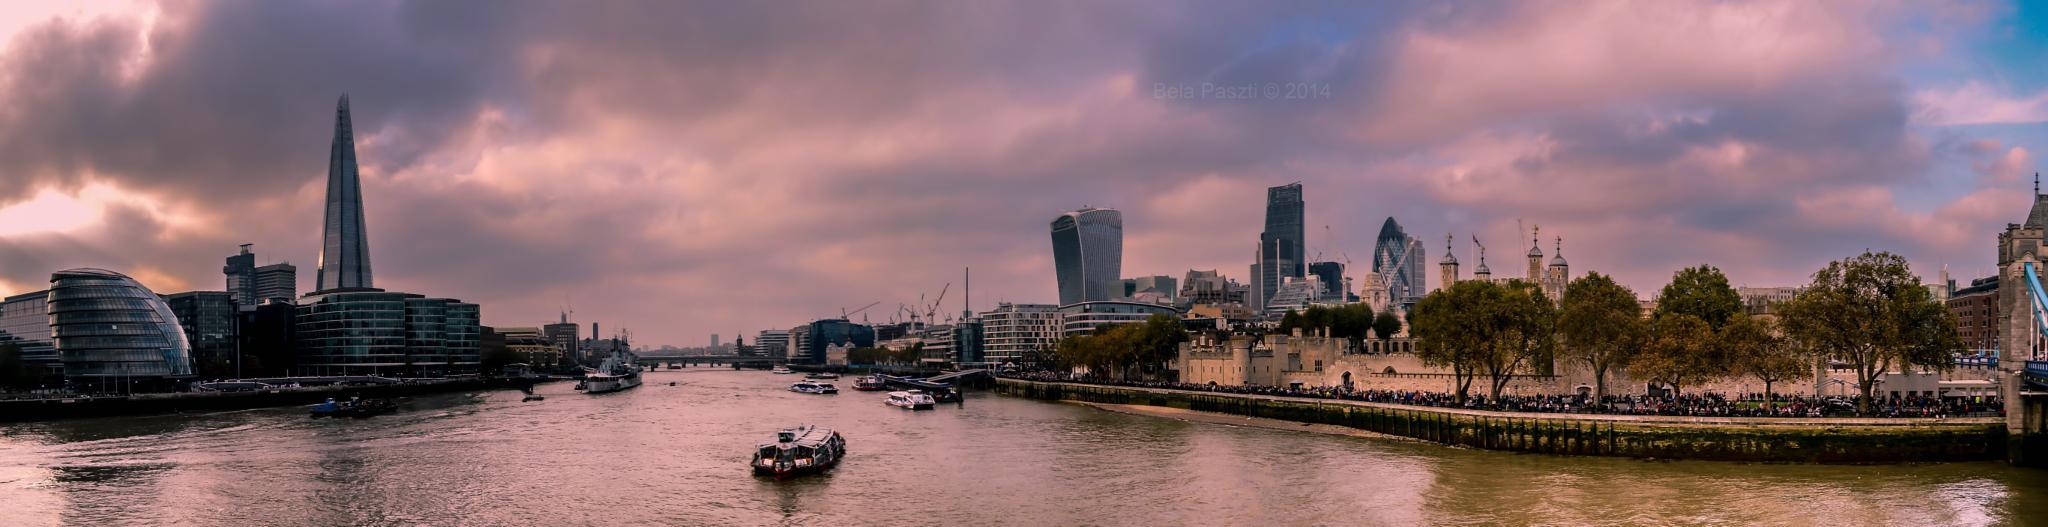 panorama from Tower Bridge by BelaPaszti